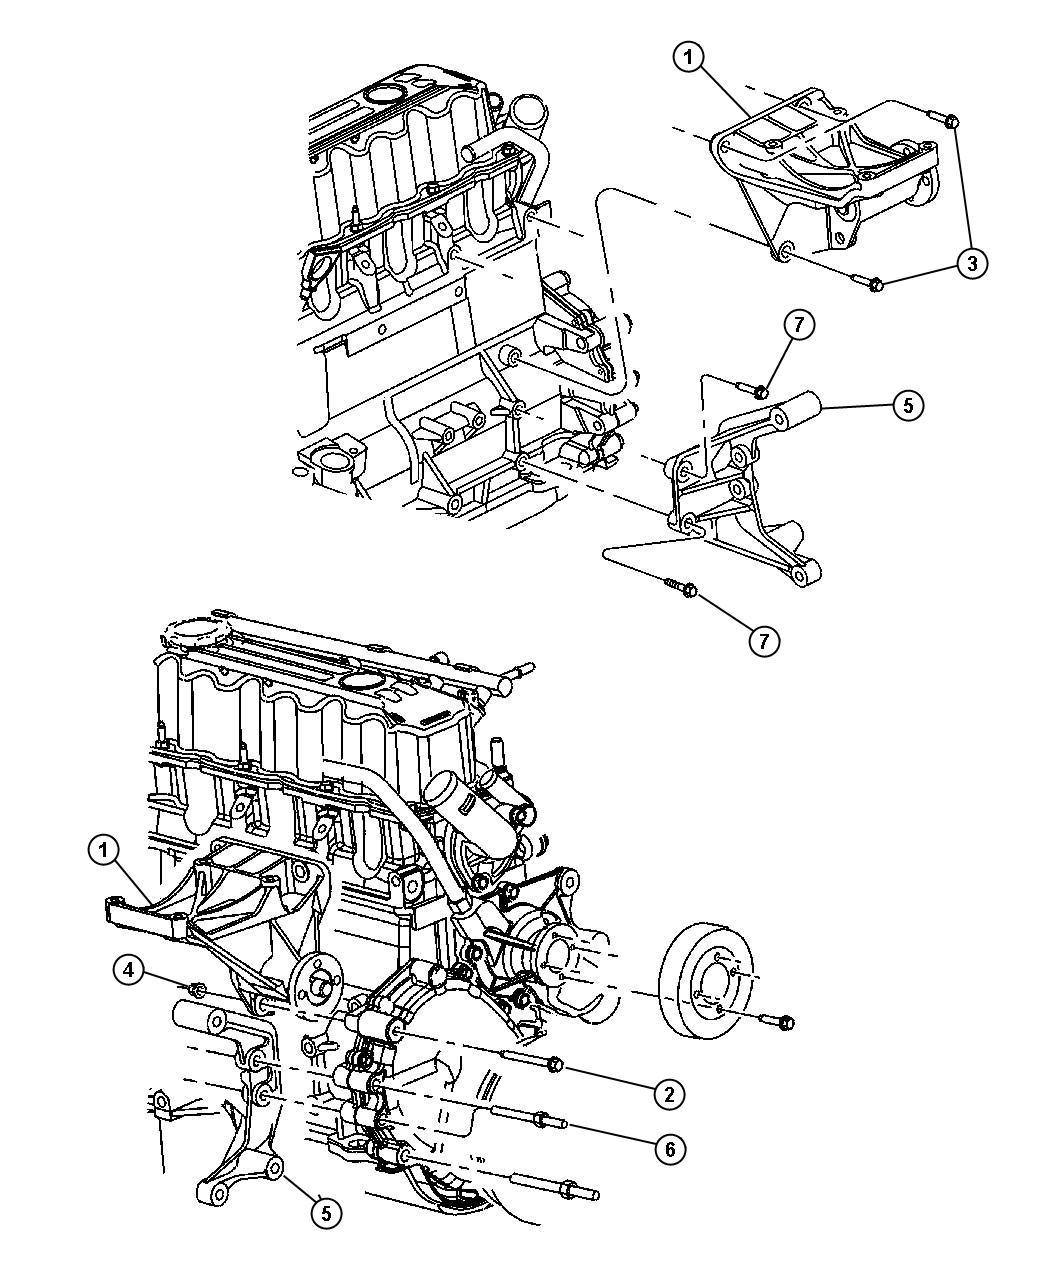 Jeep Wrangler Bracket. A/c compressor. Idler, mounting